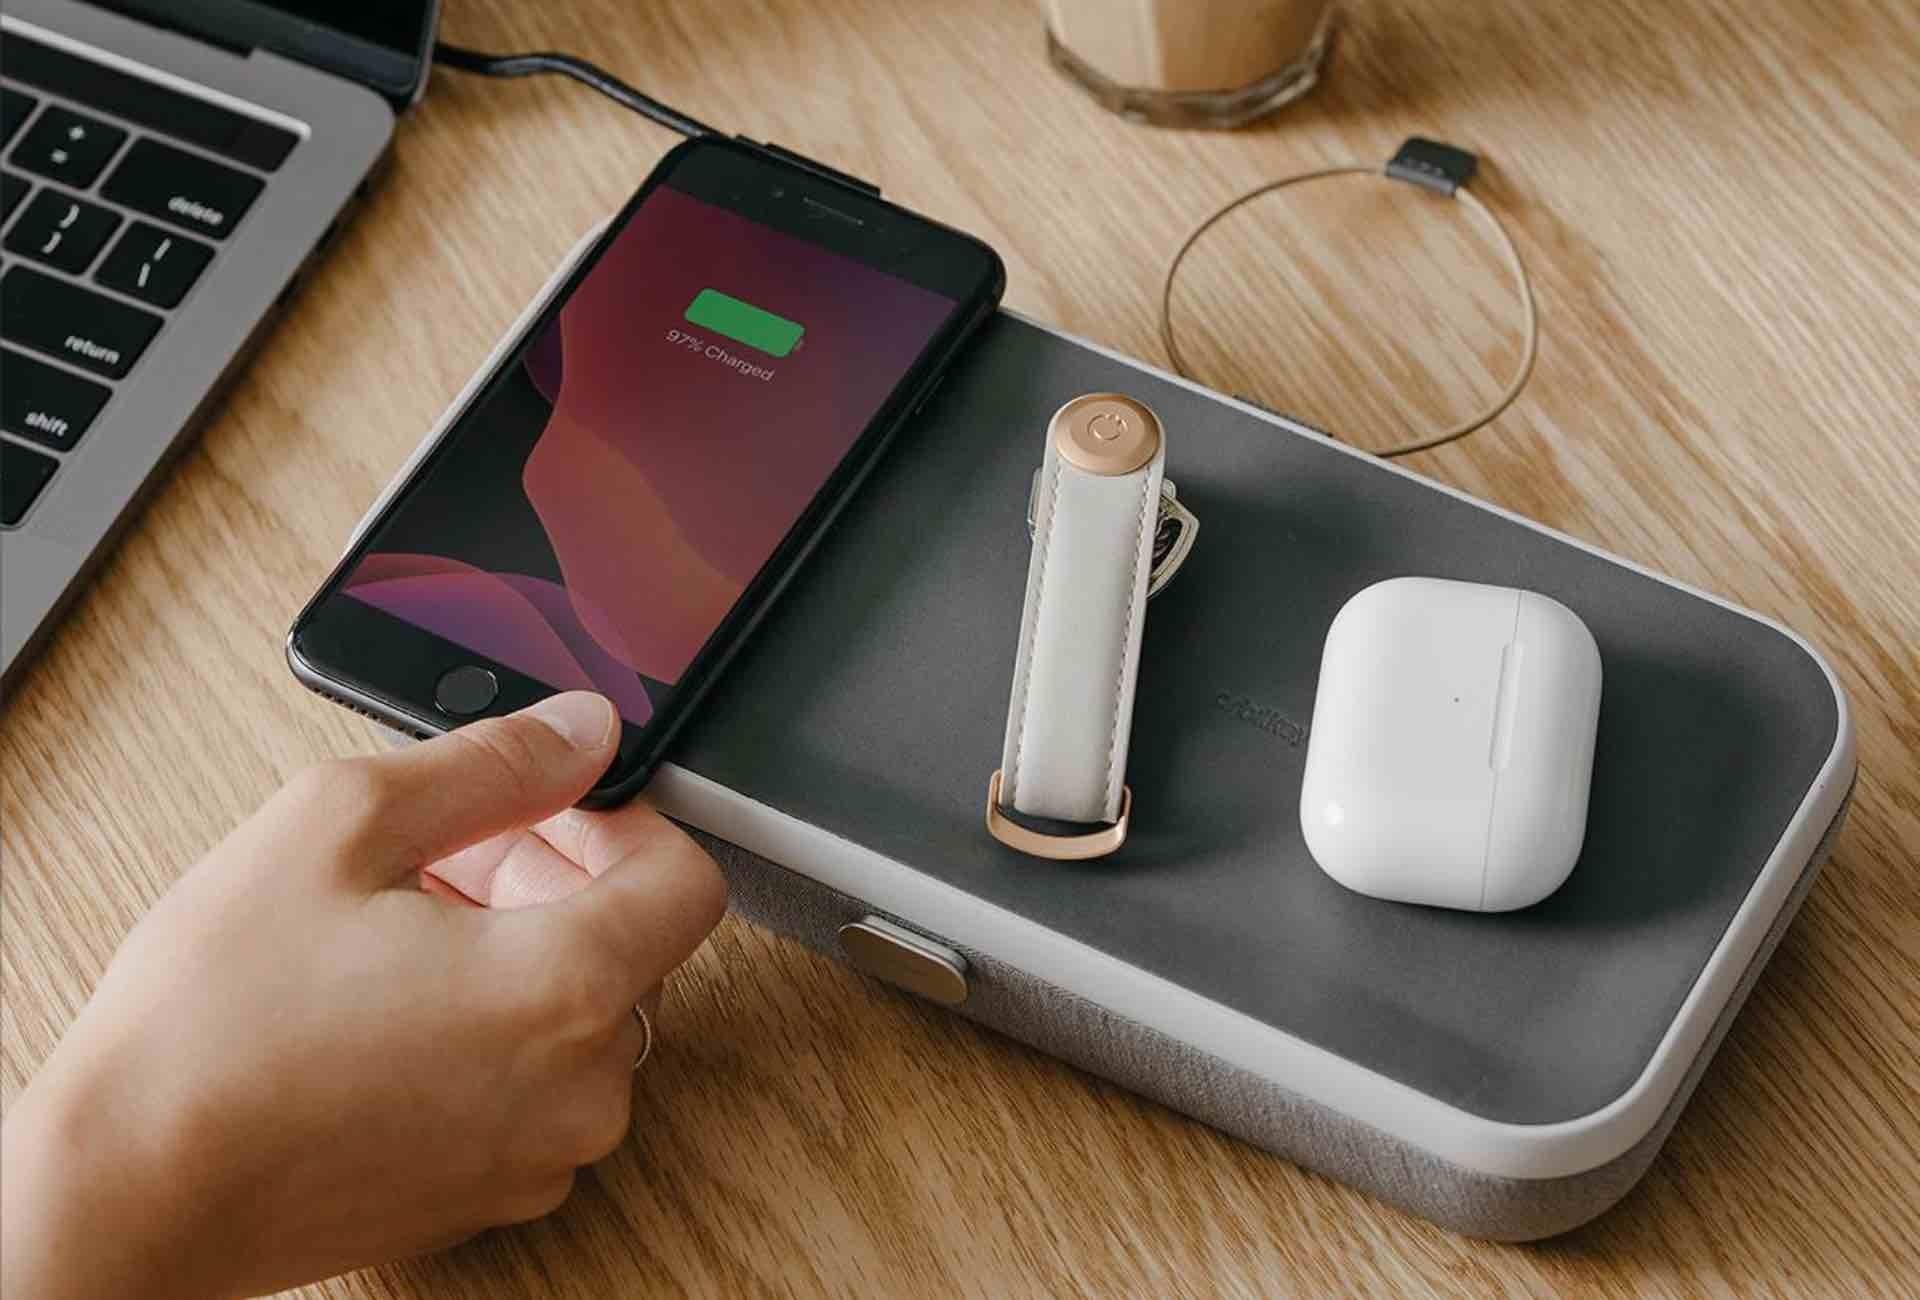 orbitkey-nest-desk-organizer-wireless-charger